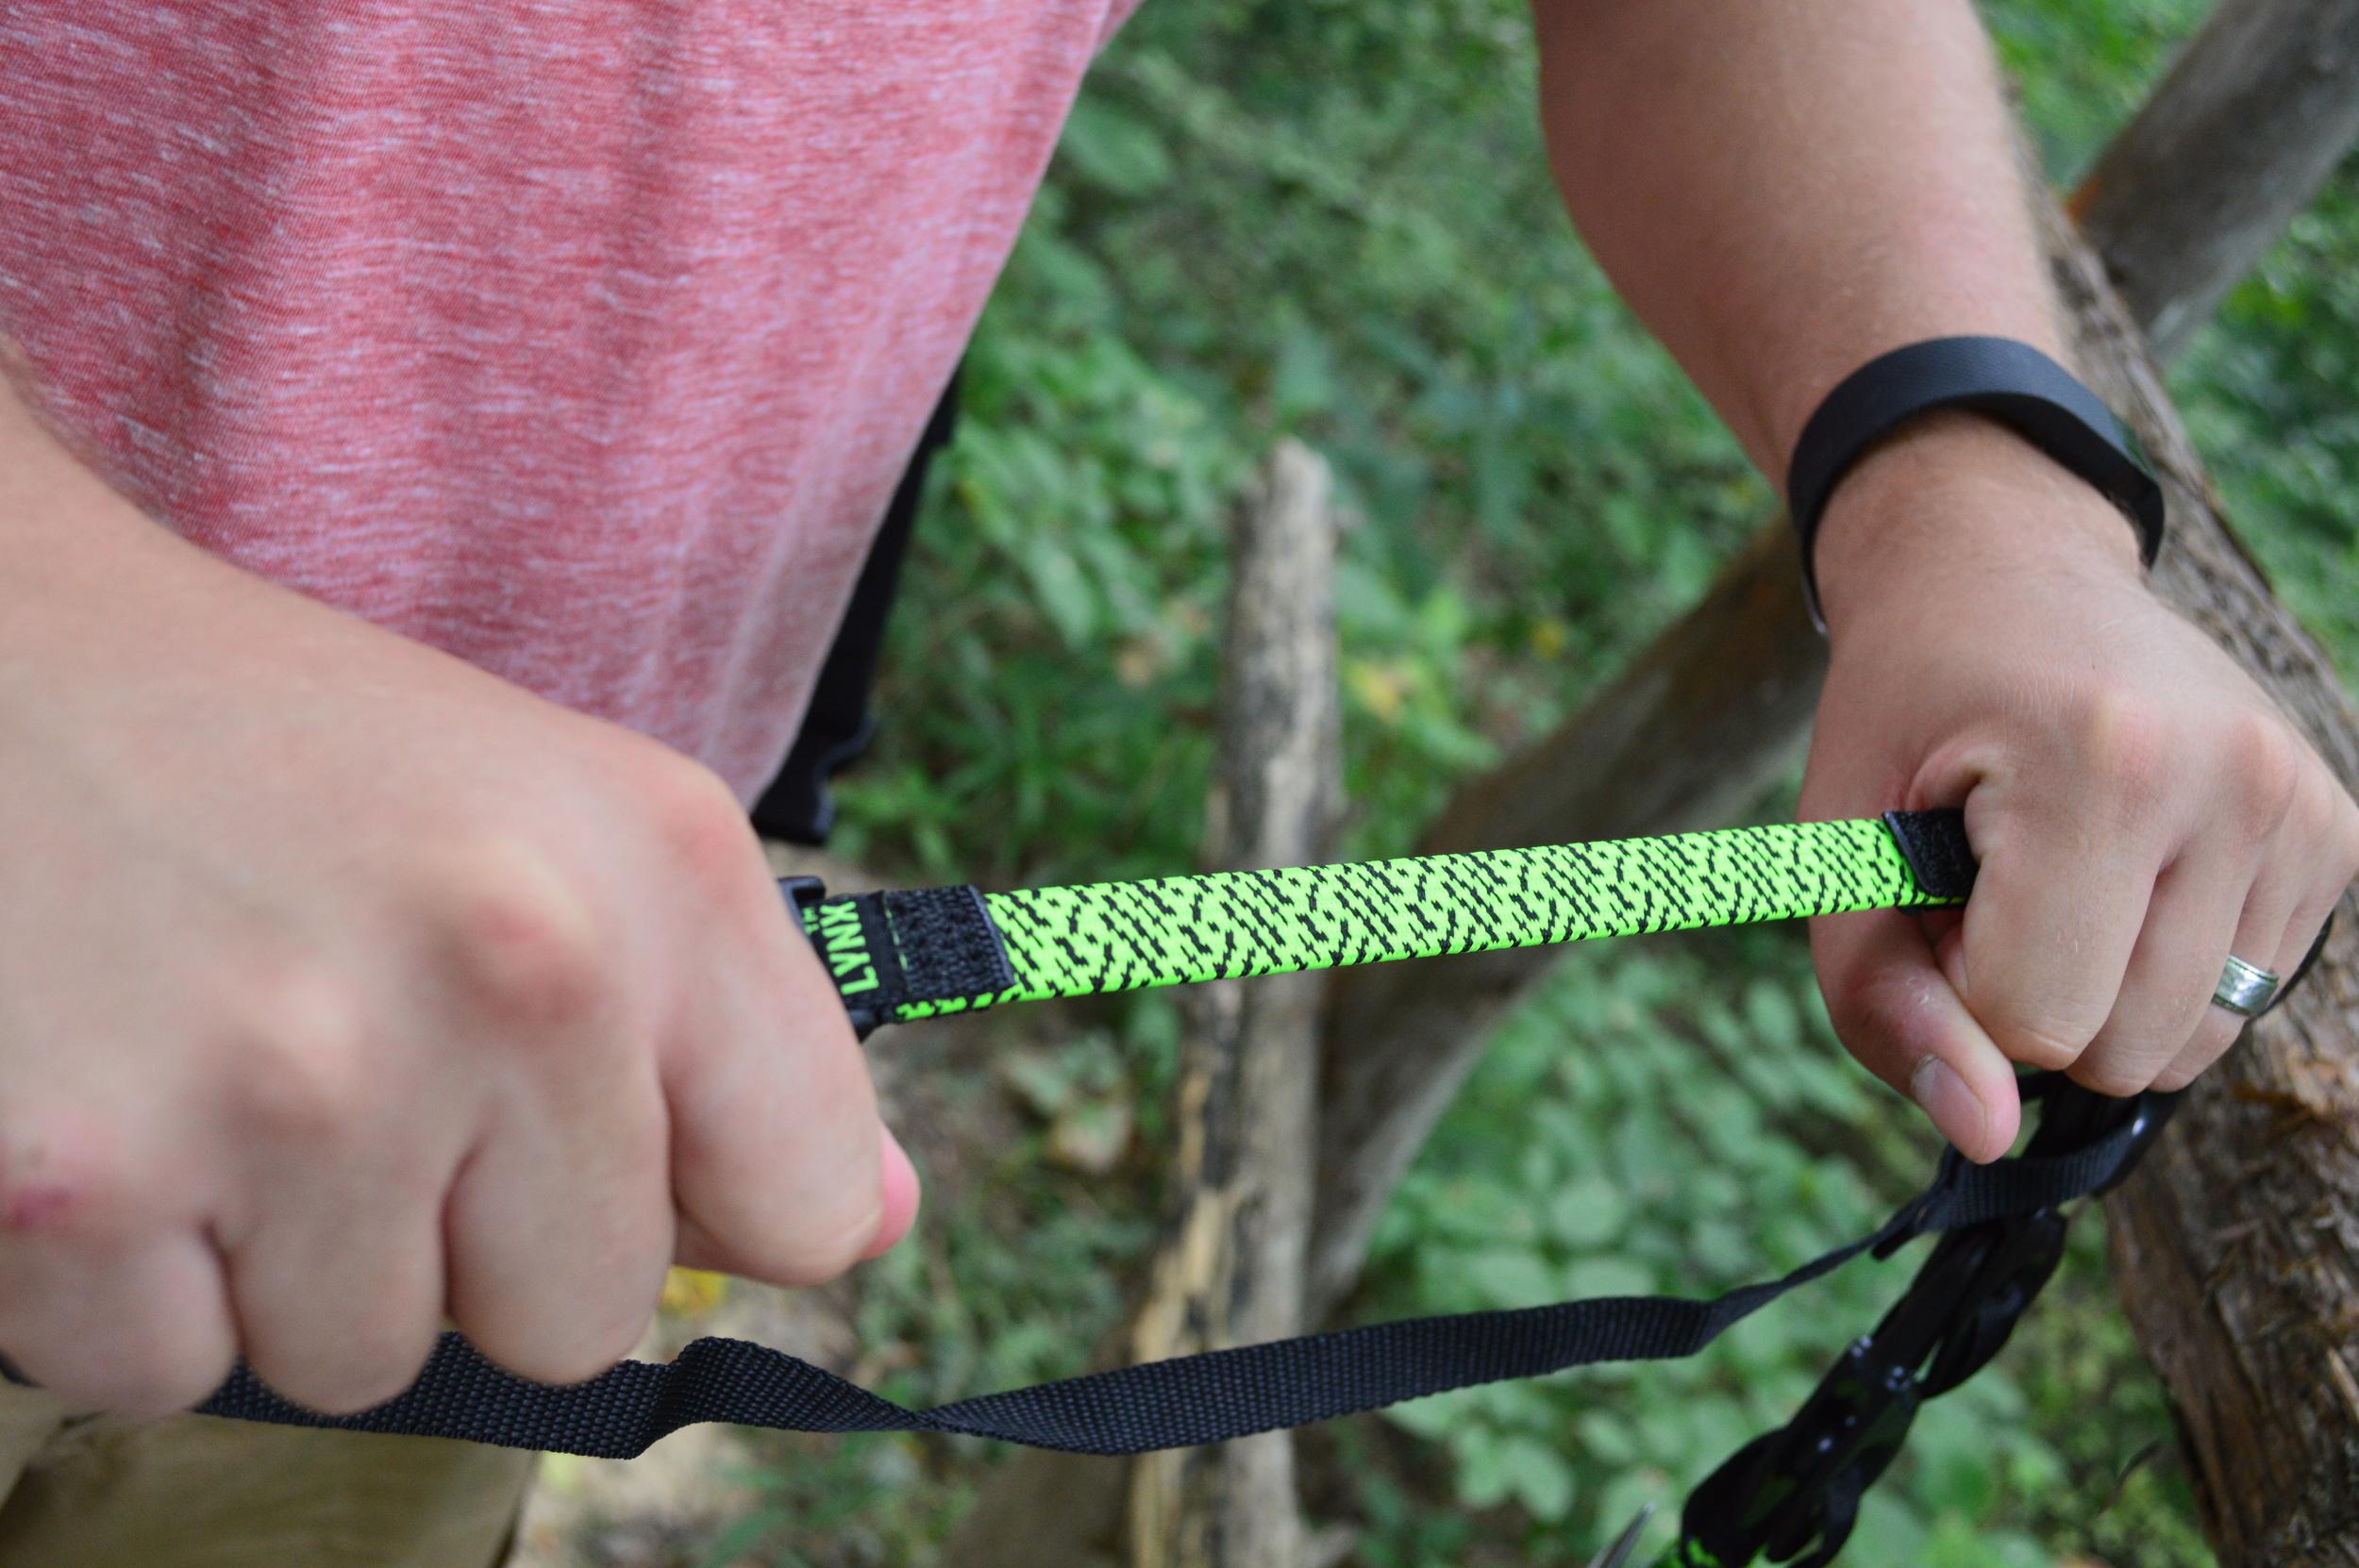 Lynx Hooks Interlocking Tie-Down System Review